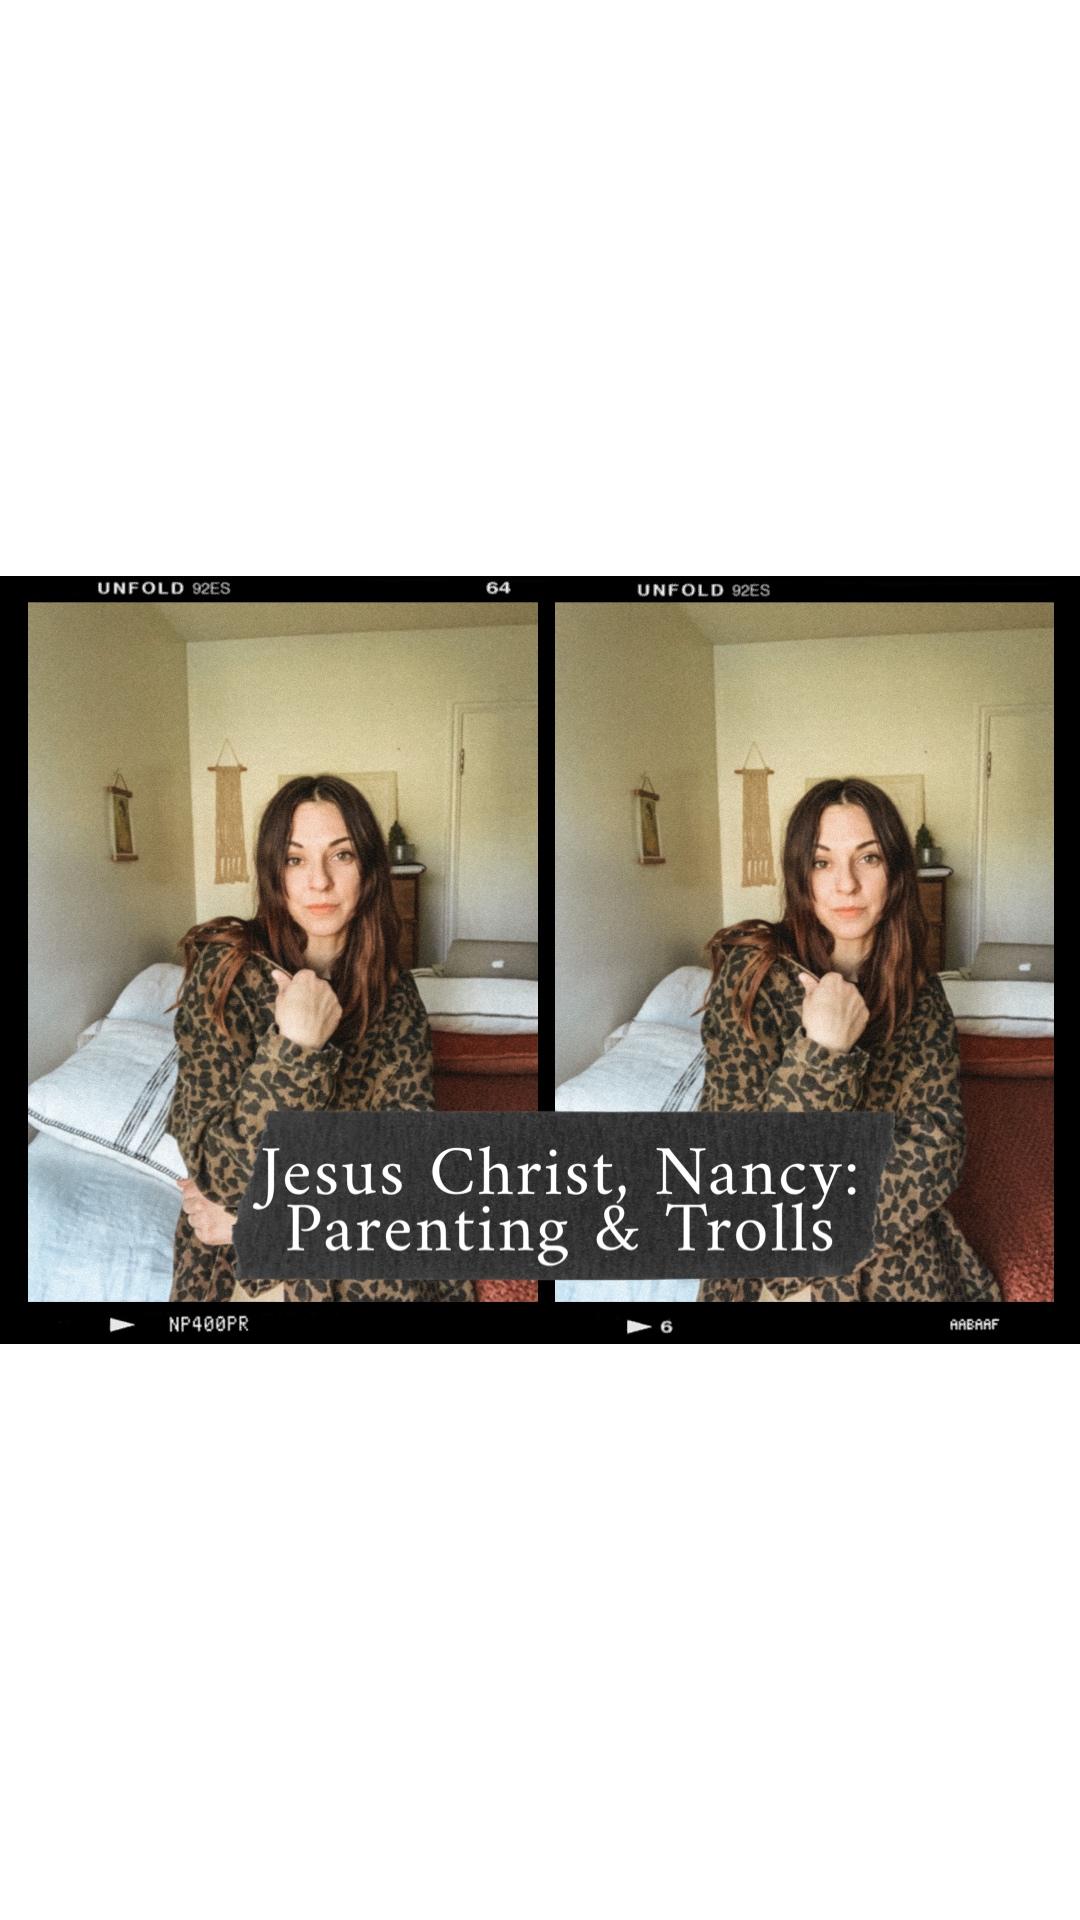 Jesus Christ, Nancy: Parenting and Trolls